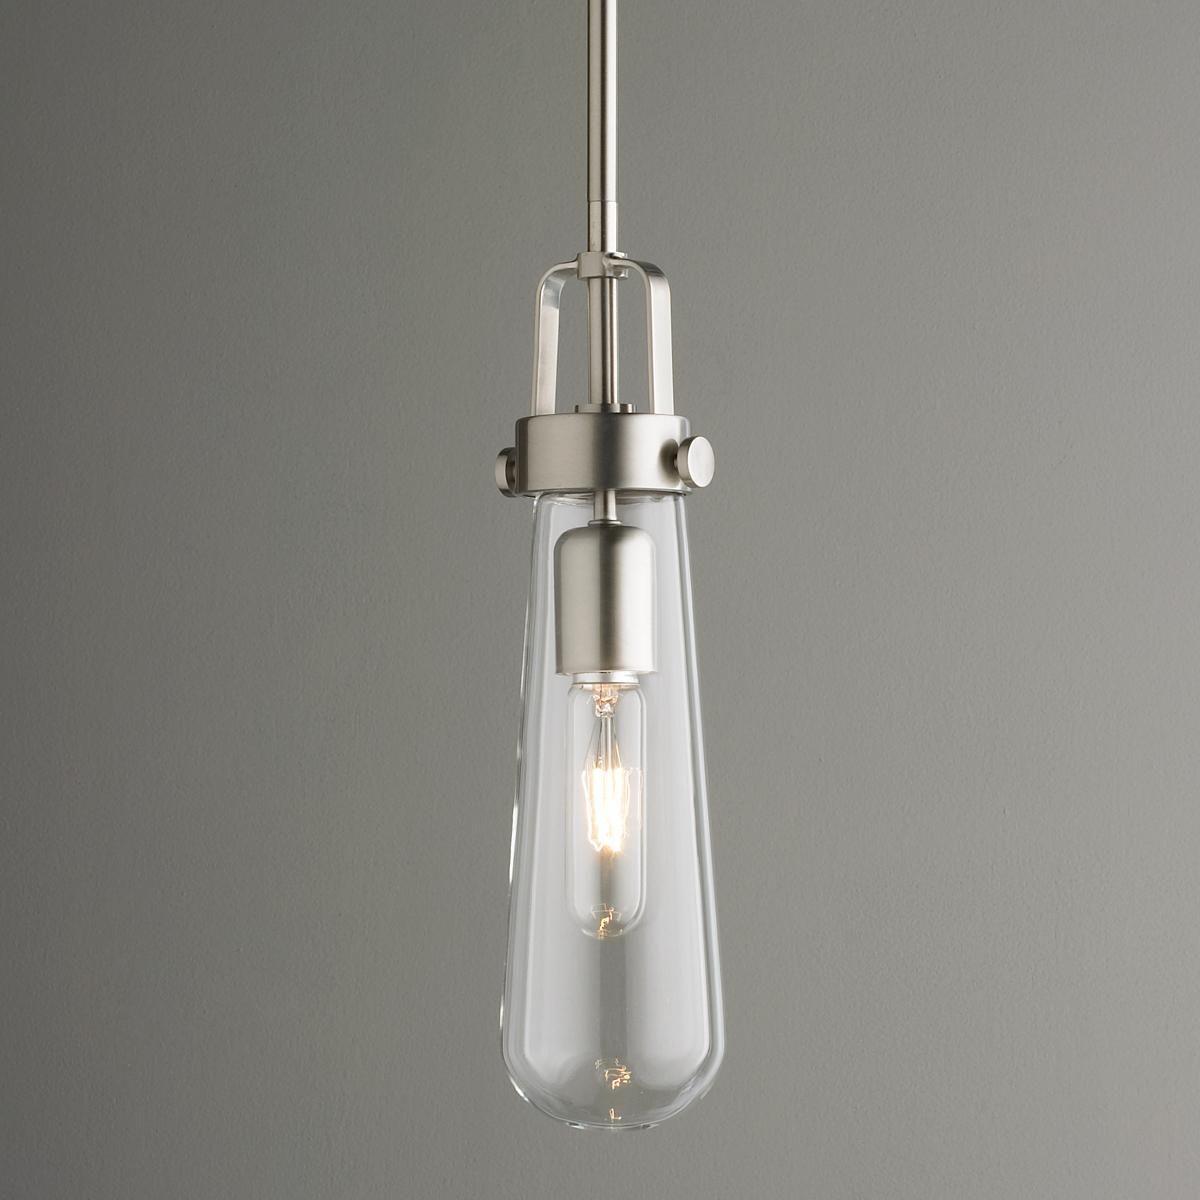 clear glass pendants lighting. Clear Glass Vial Pendant Light Blending Modern Aesthetic With Industrial-chic Design, This Hanging Pendants Lighting S